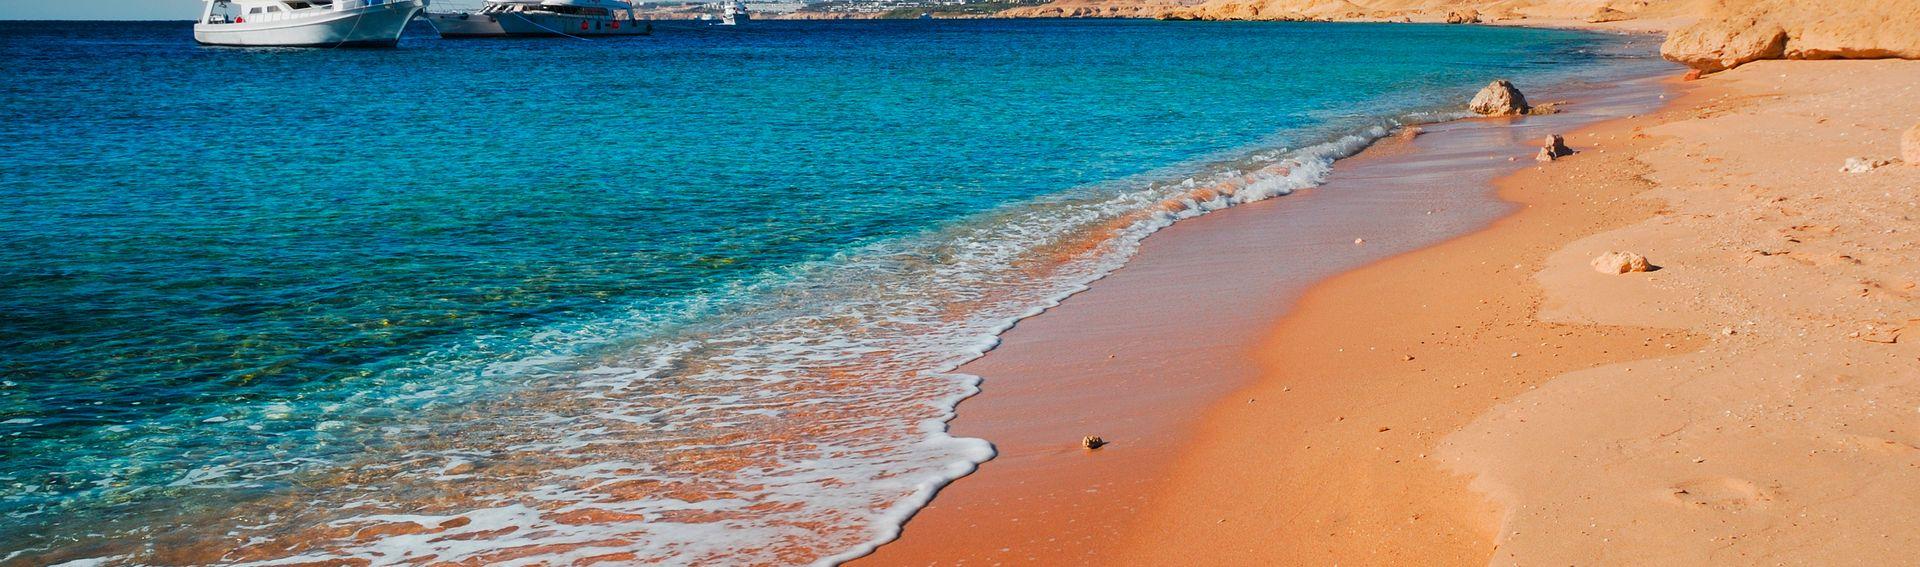 Sinai Halbinsel